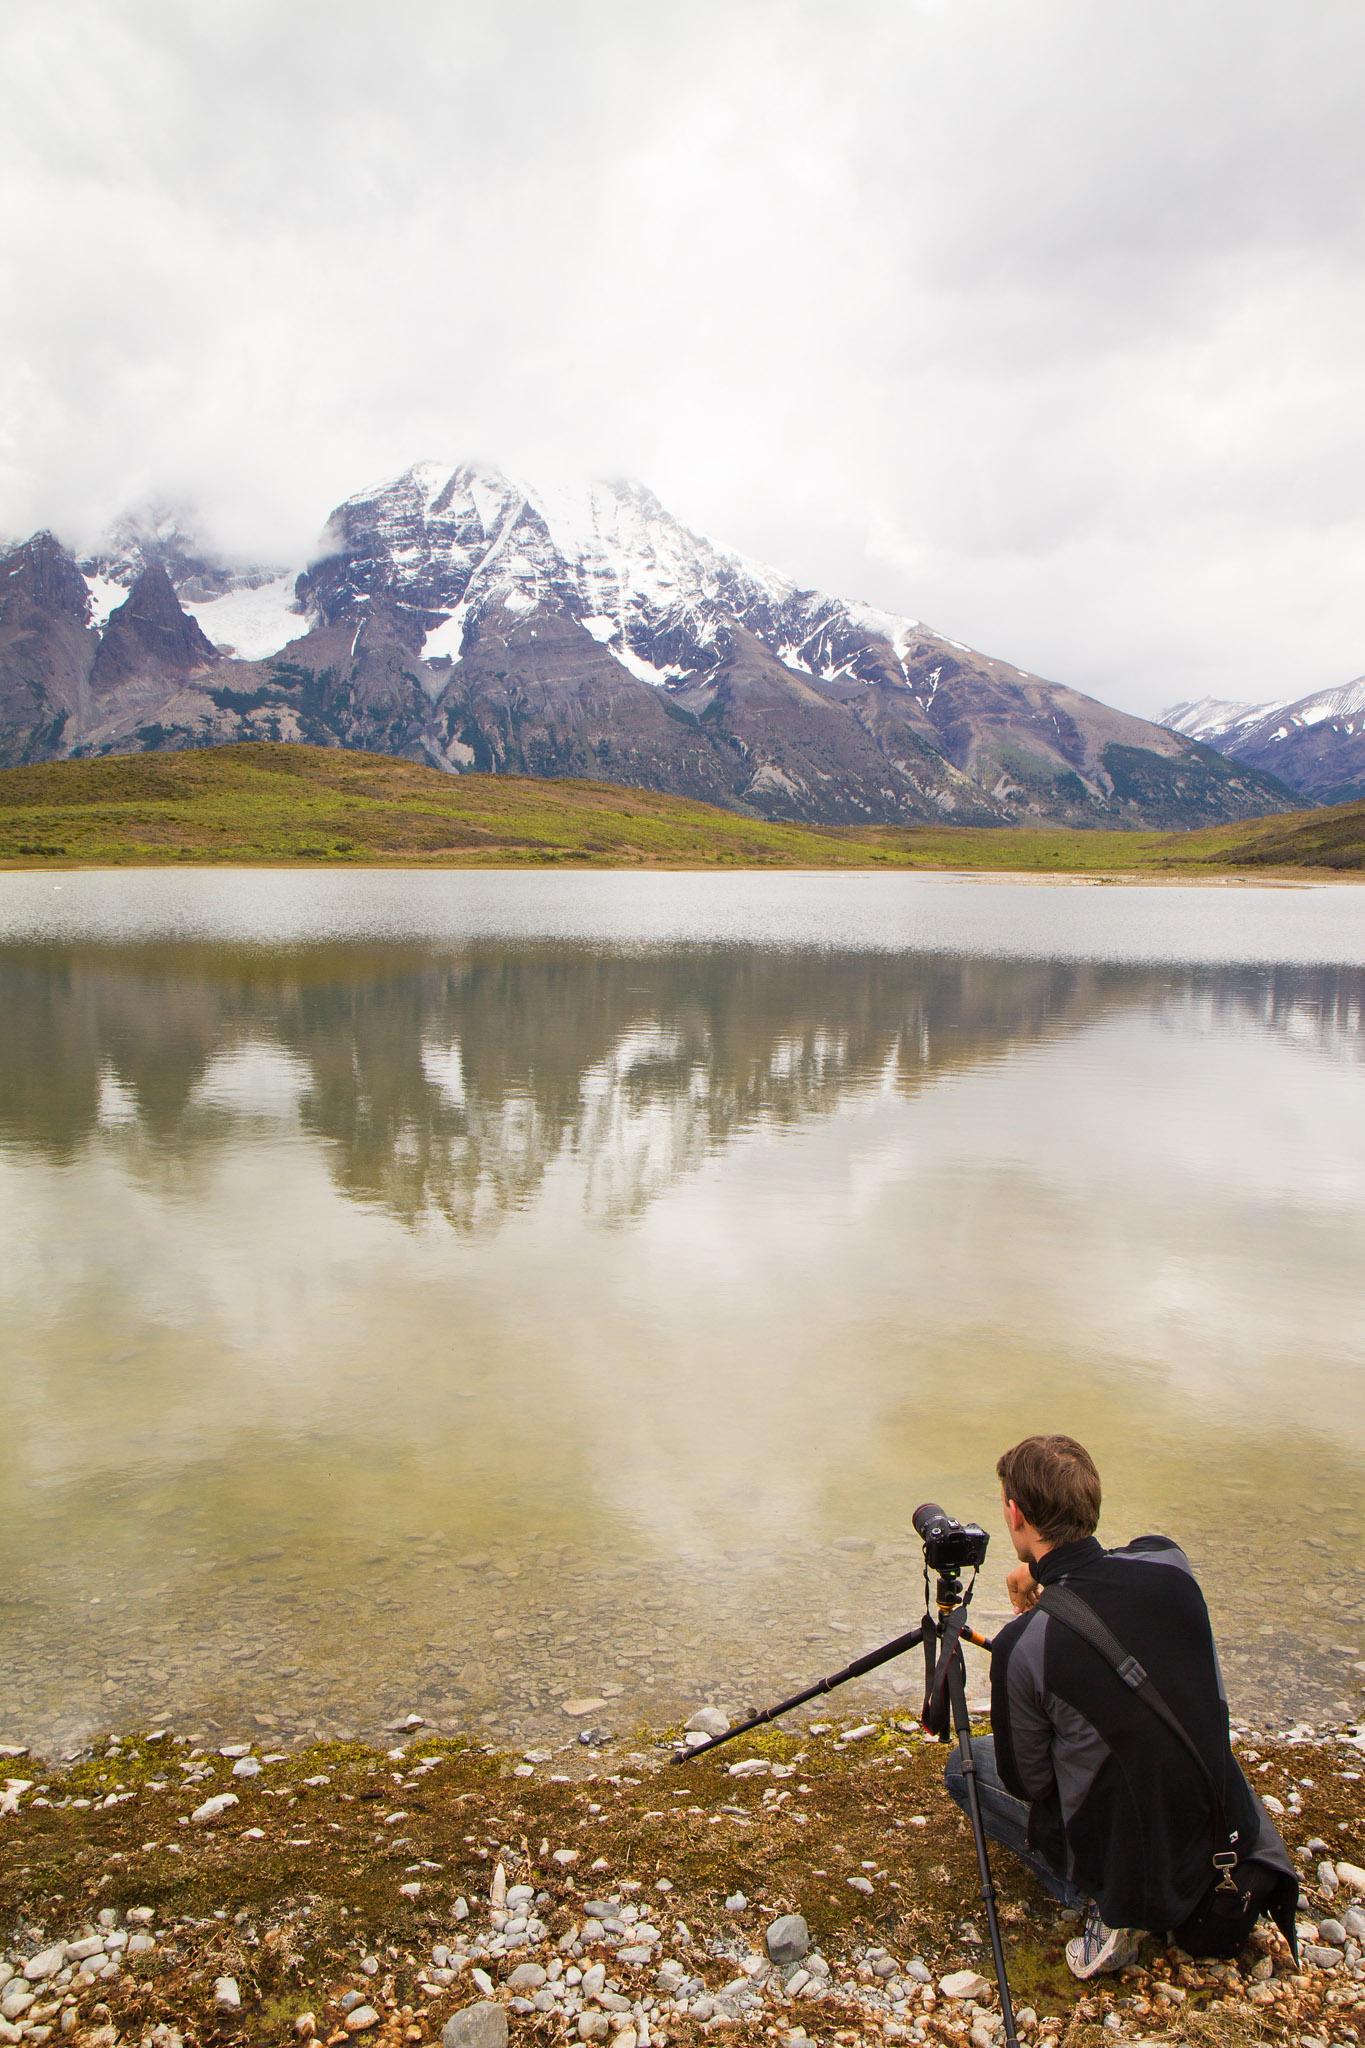 Wedding-Travellers-Overlanding-Destination-Wedding-Chile-Torres-del-Paine-laguna-lake-azul-backstage-photographer-taking-picture-outside-nature